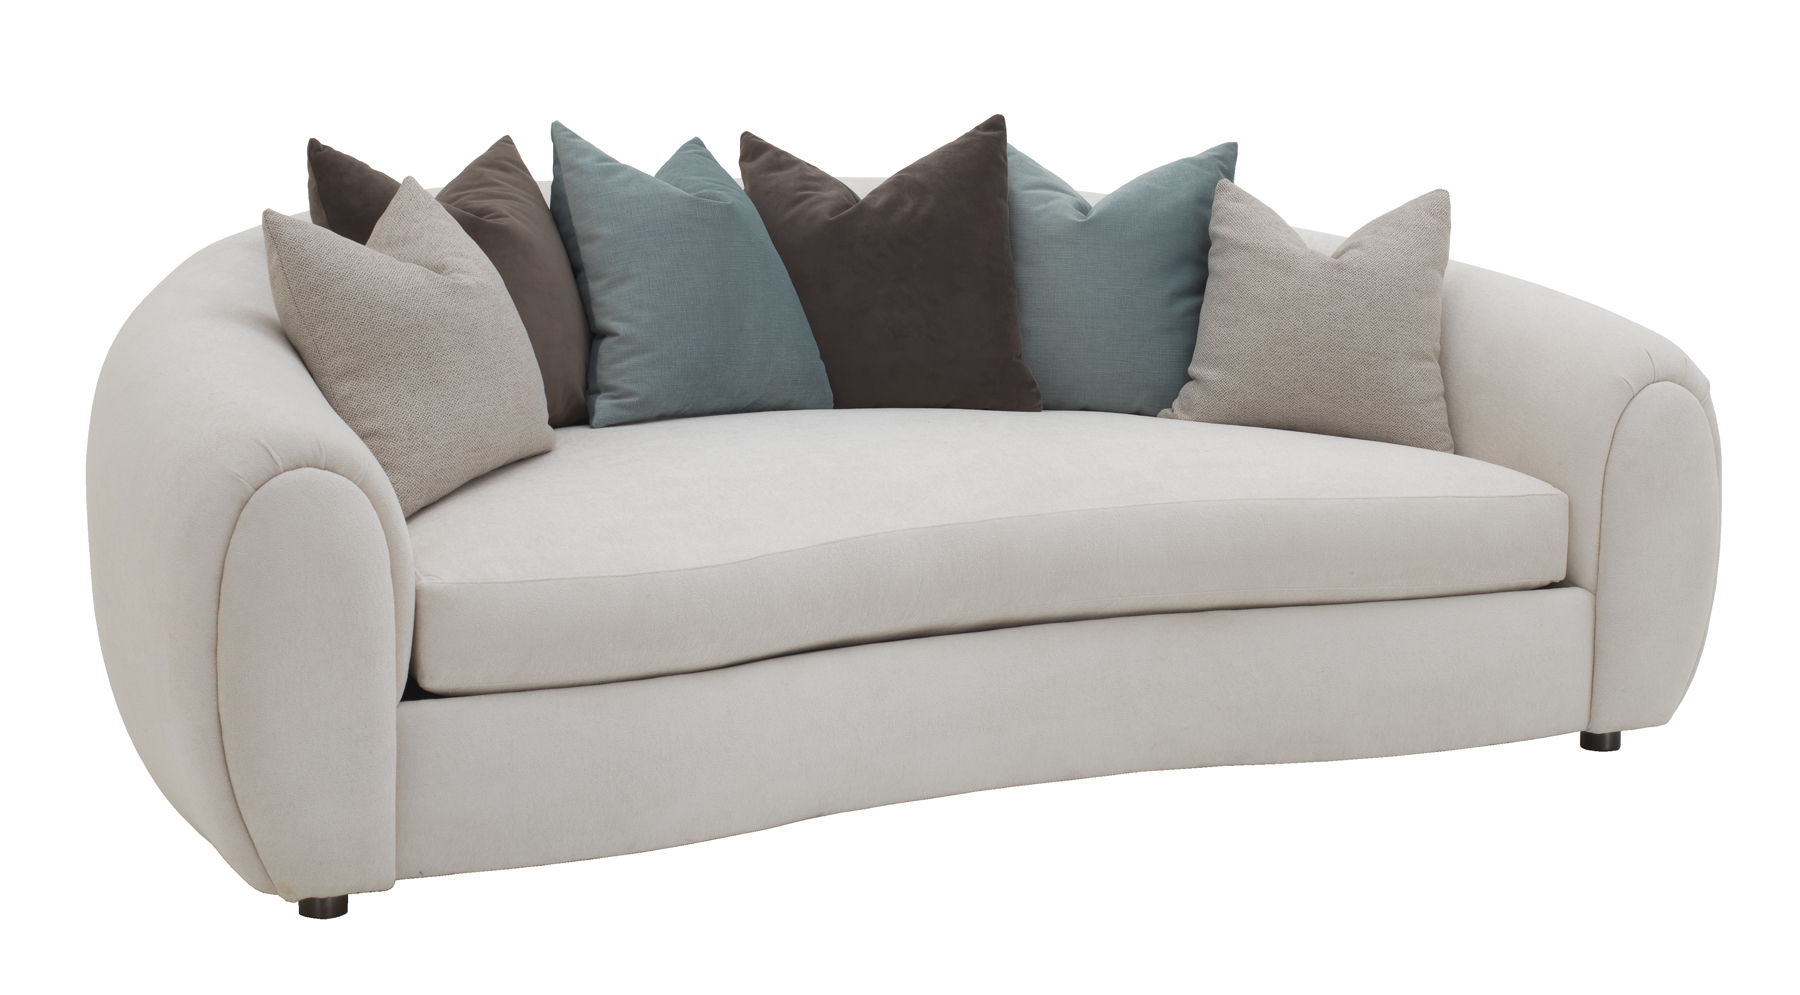 Designers Furniture Glendale New Haven Sofa | Designers Furniture For Haven Sofa Chairs (View 15 of 25)